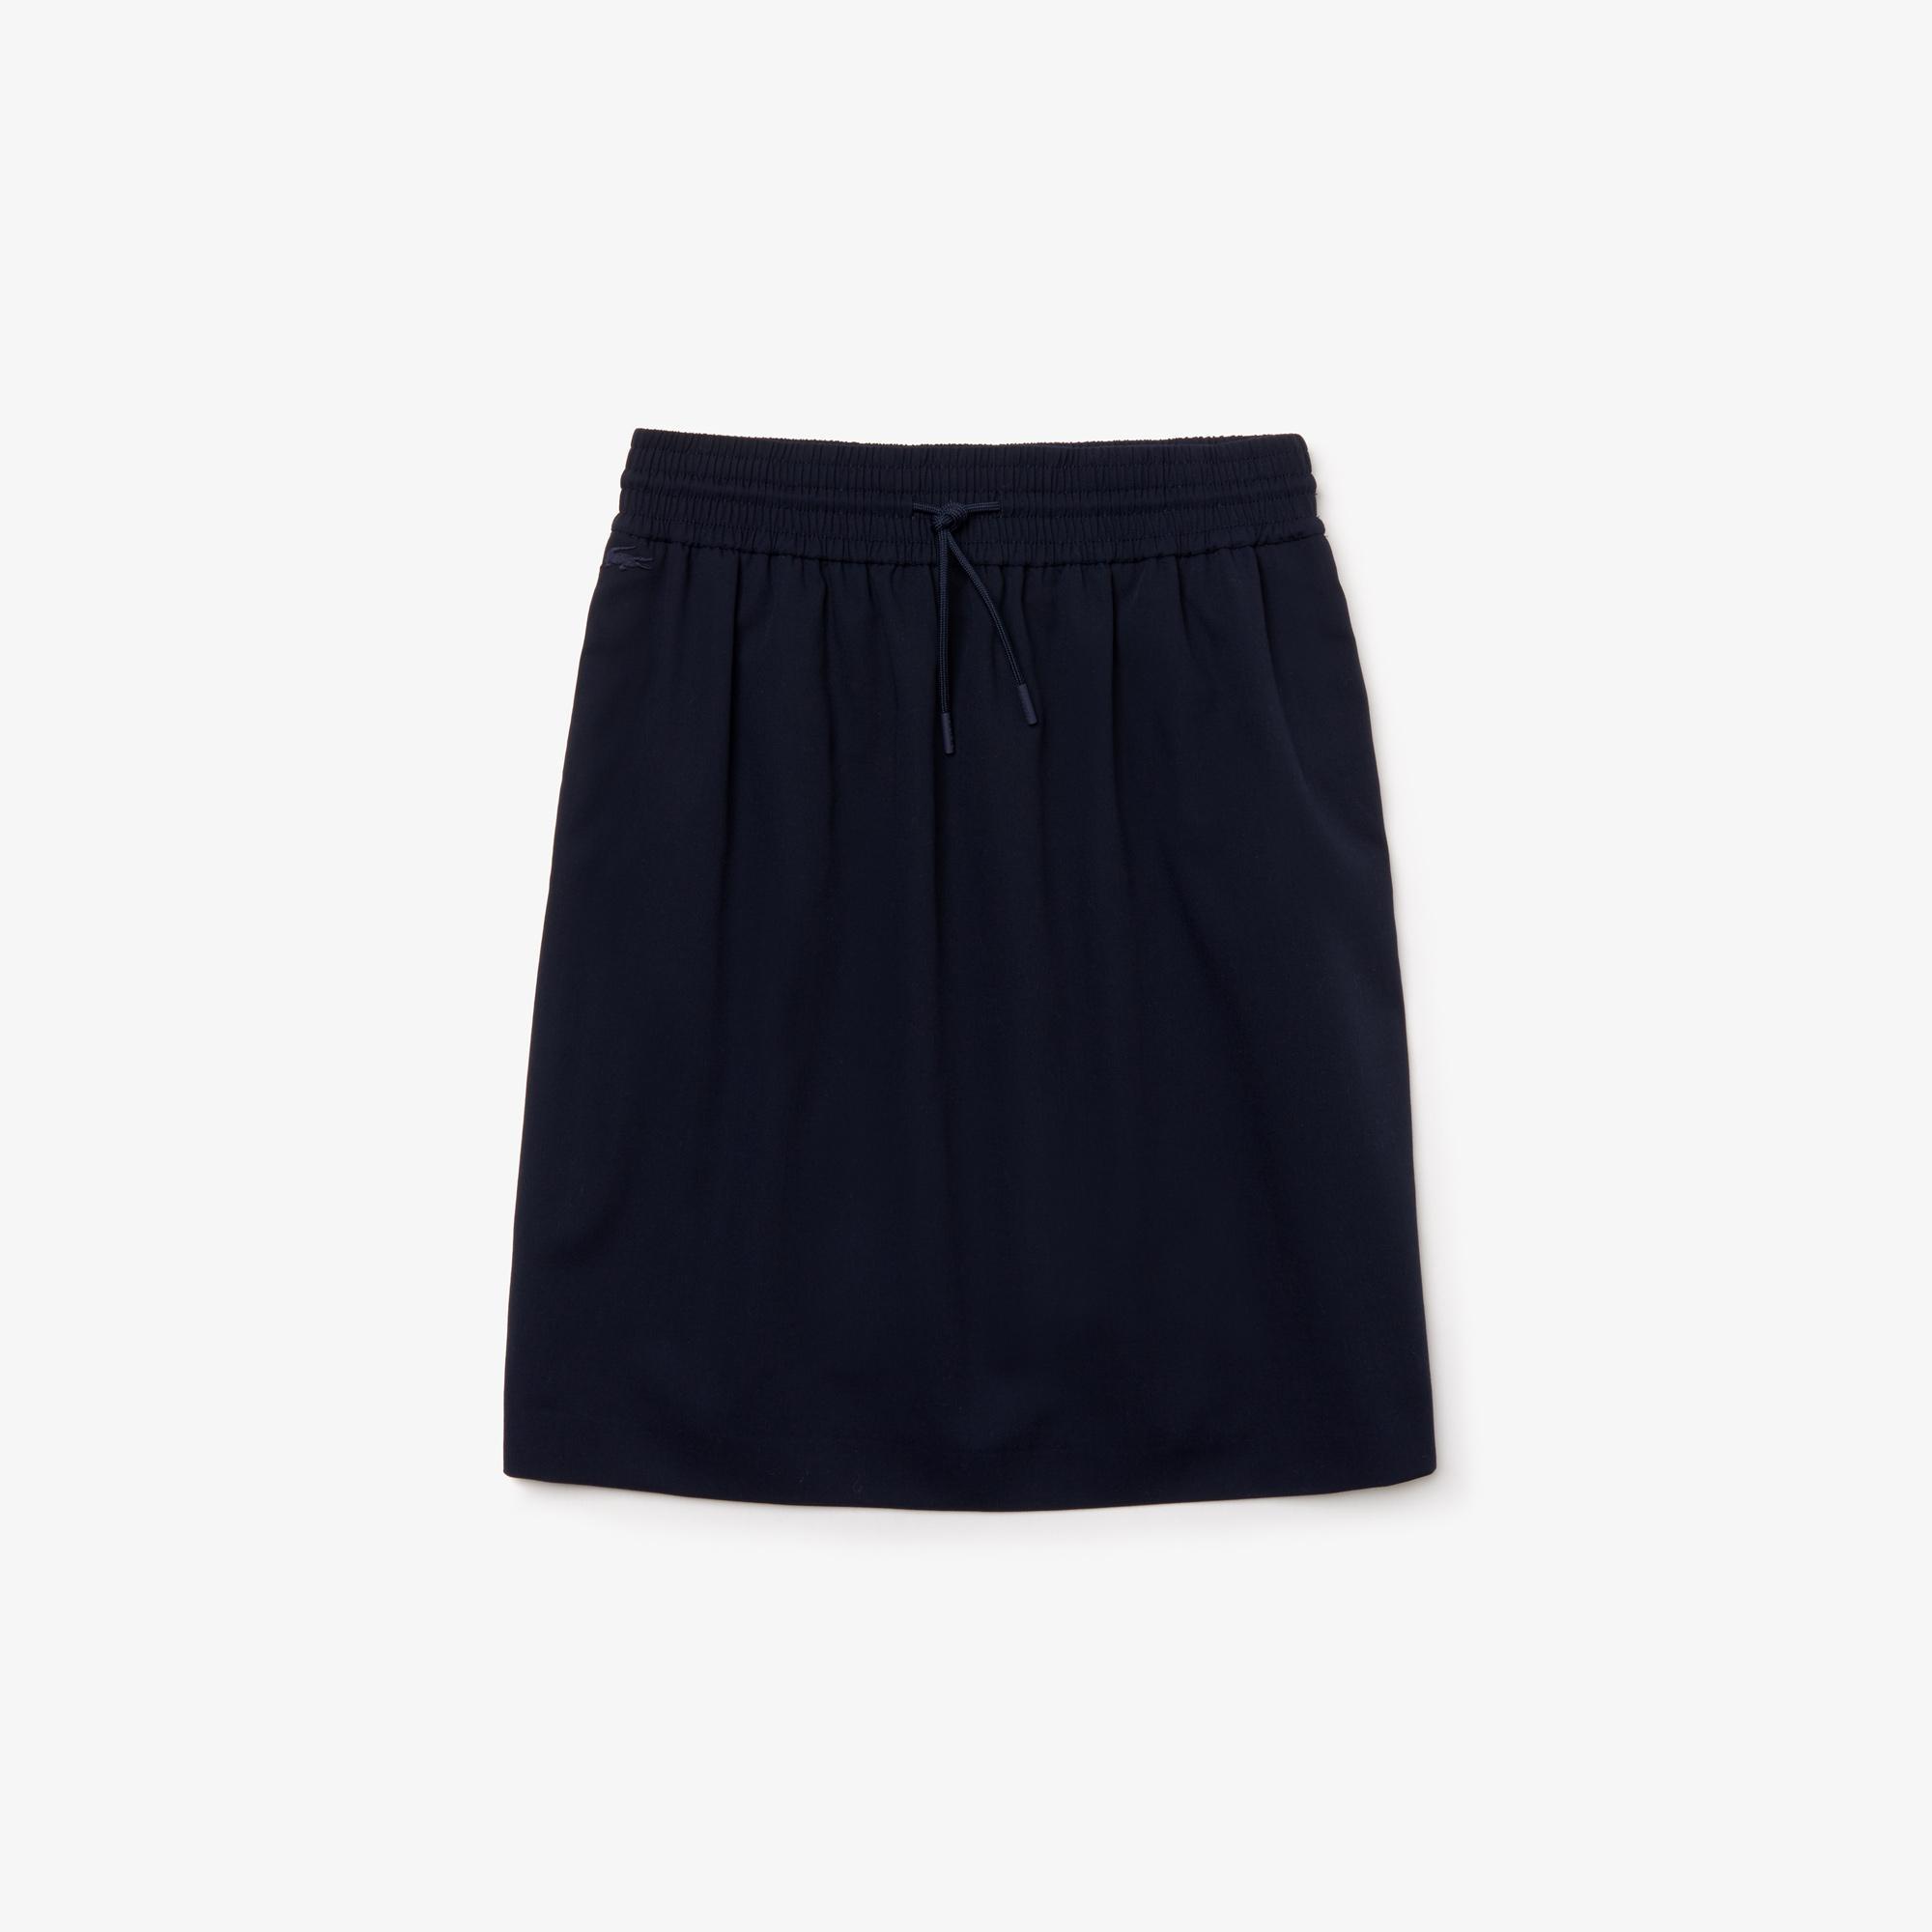 Lacoste Women's Skirts